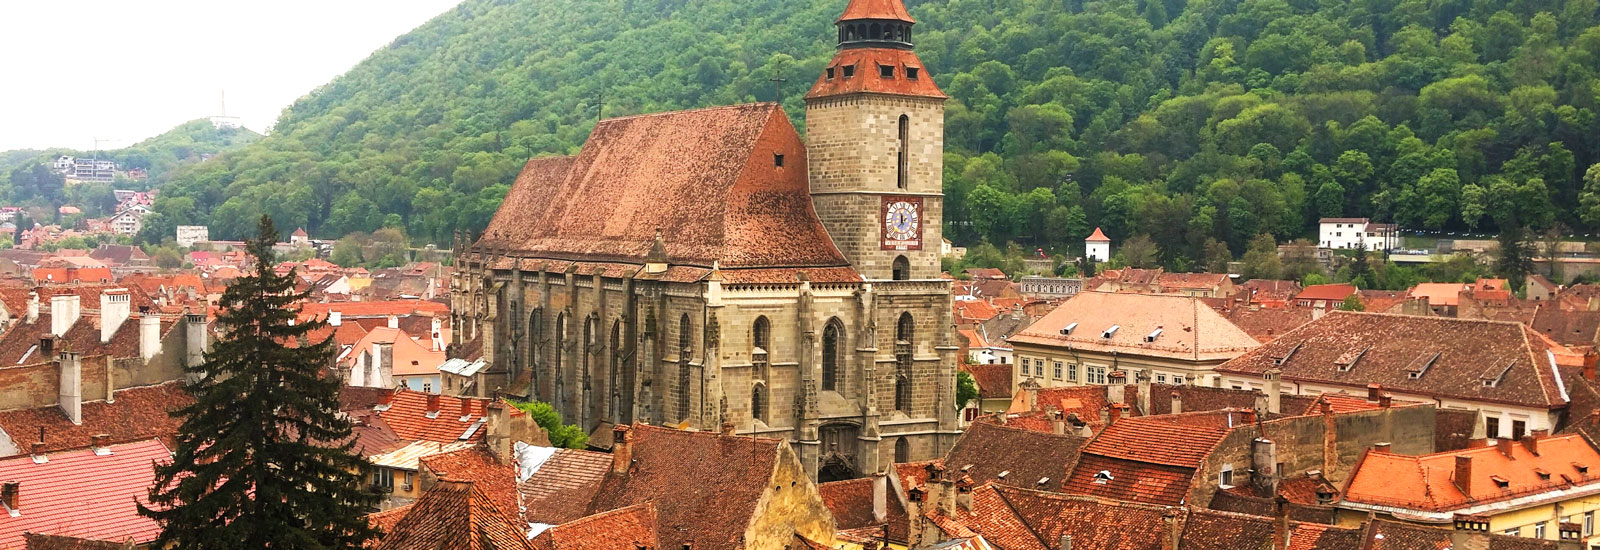 Tours in Romania